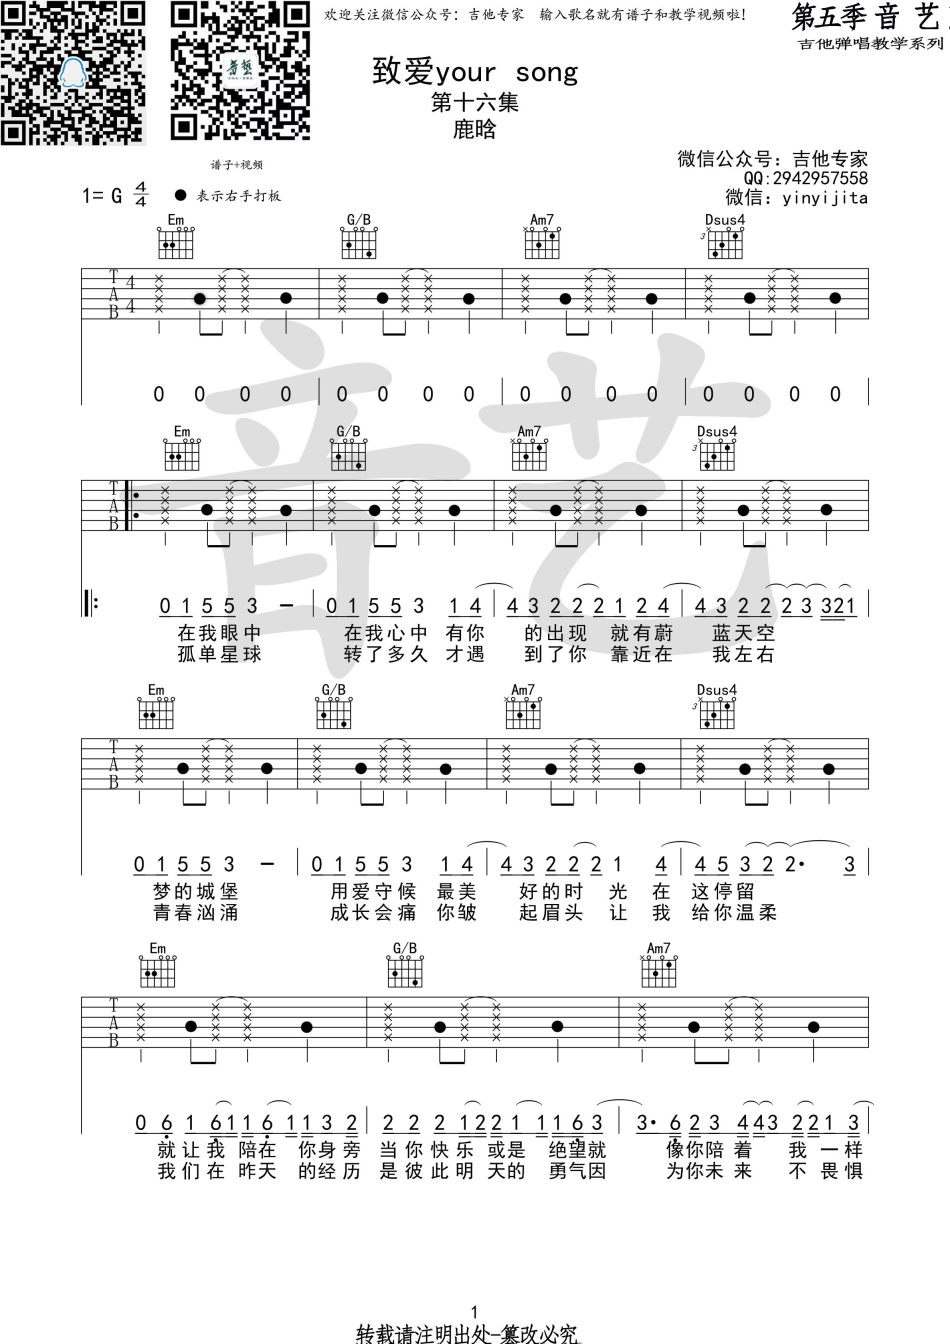 致爱your song 鹿晗 - 吉他谱 - 嗨吉他